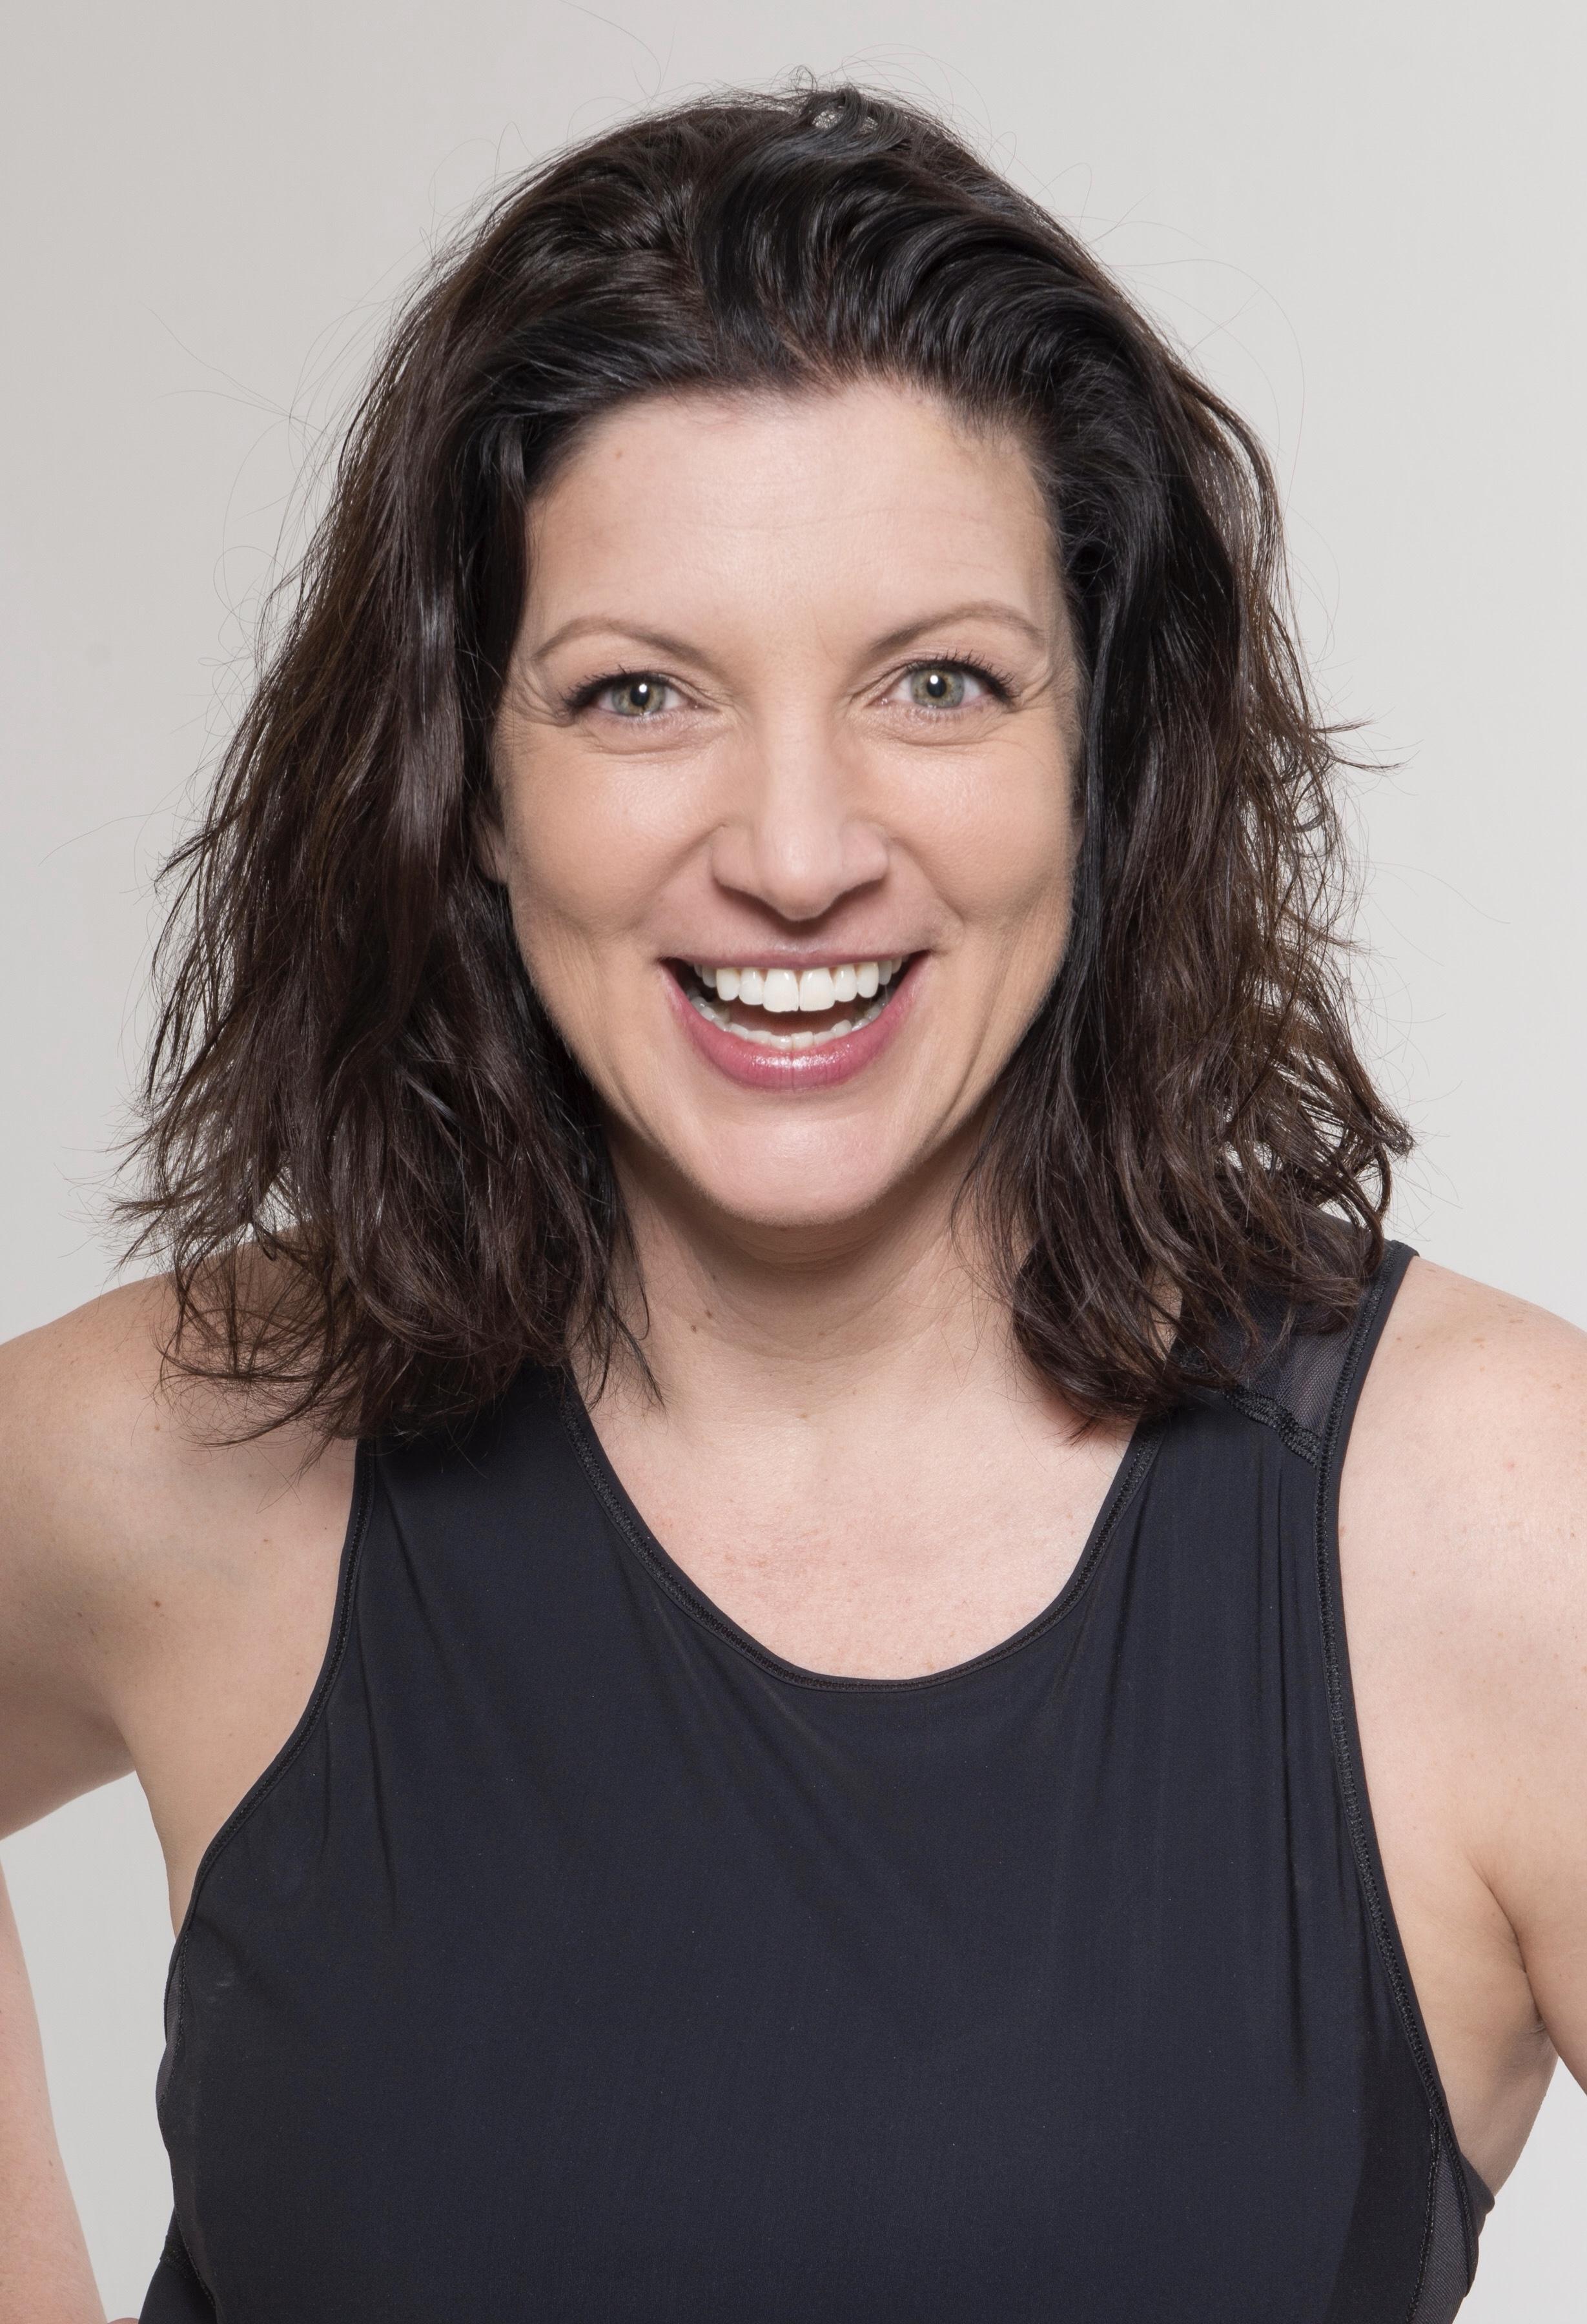 Gina Caputo